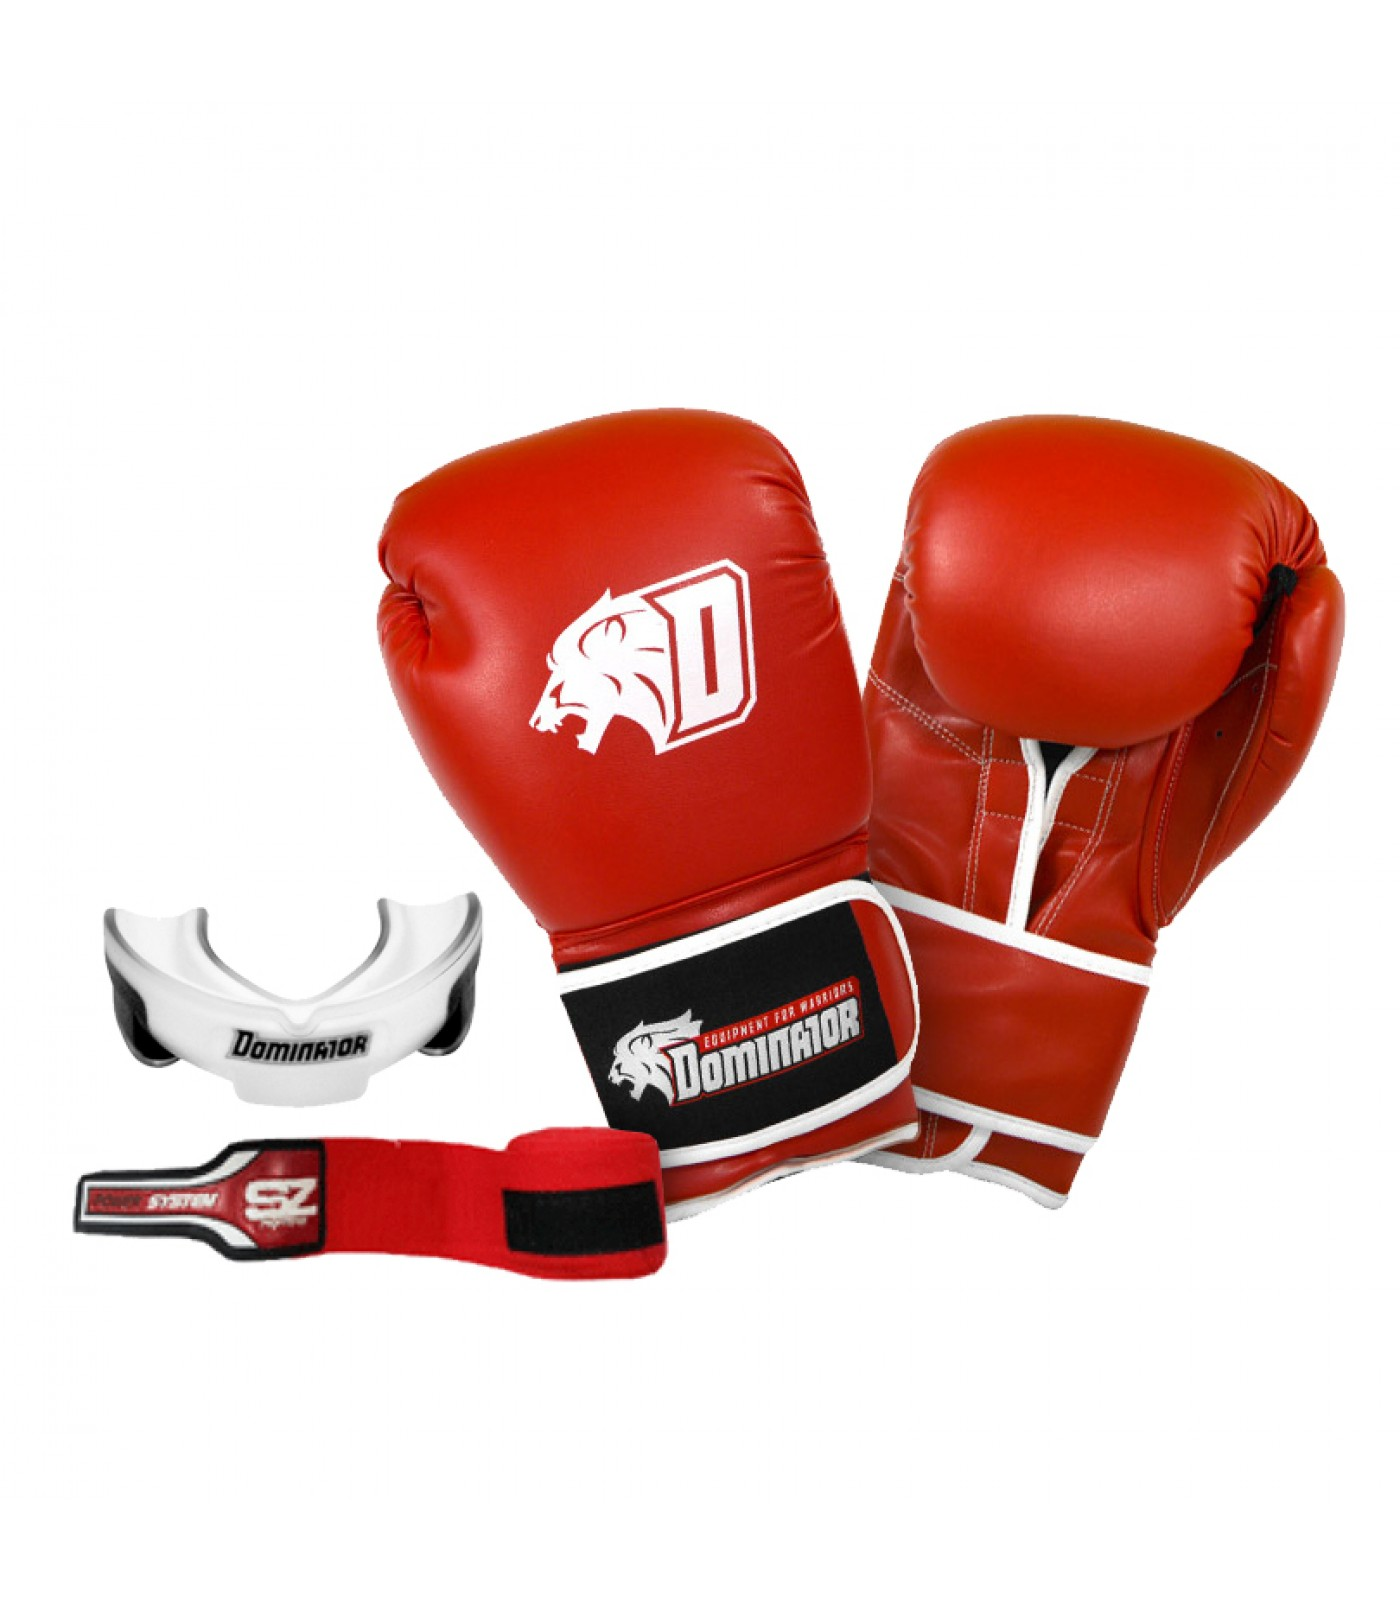 Стак 5 - Червени боксови ръкавици + червен бинт + гума